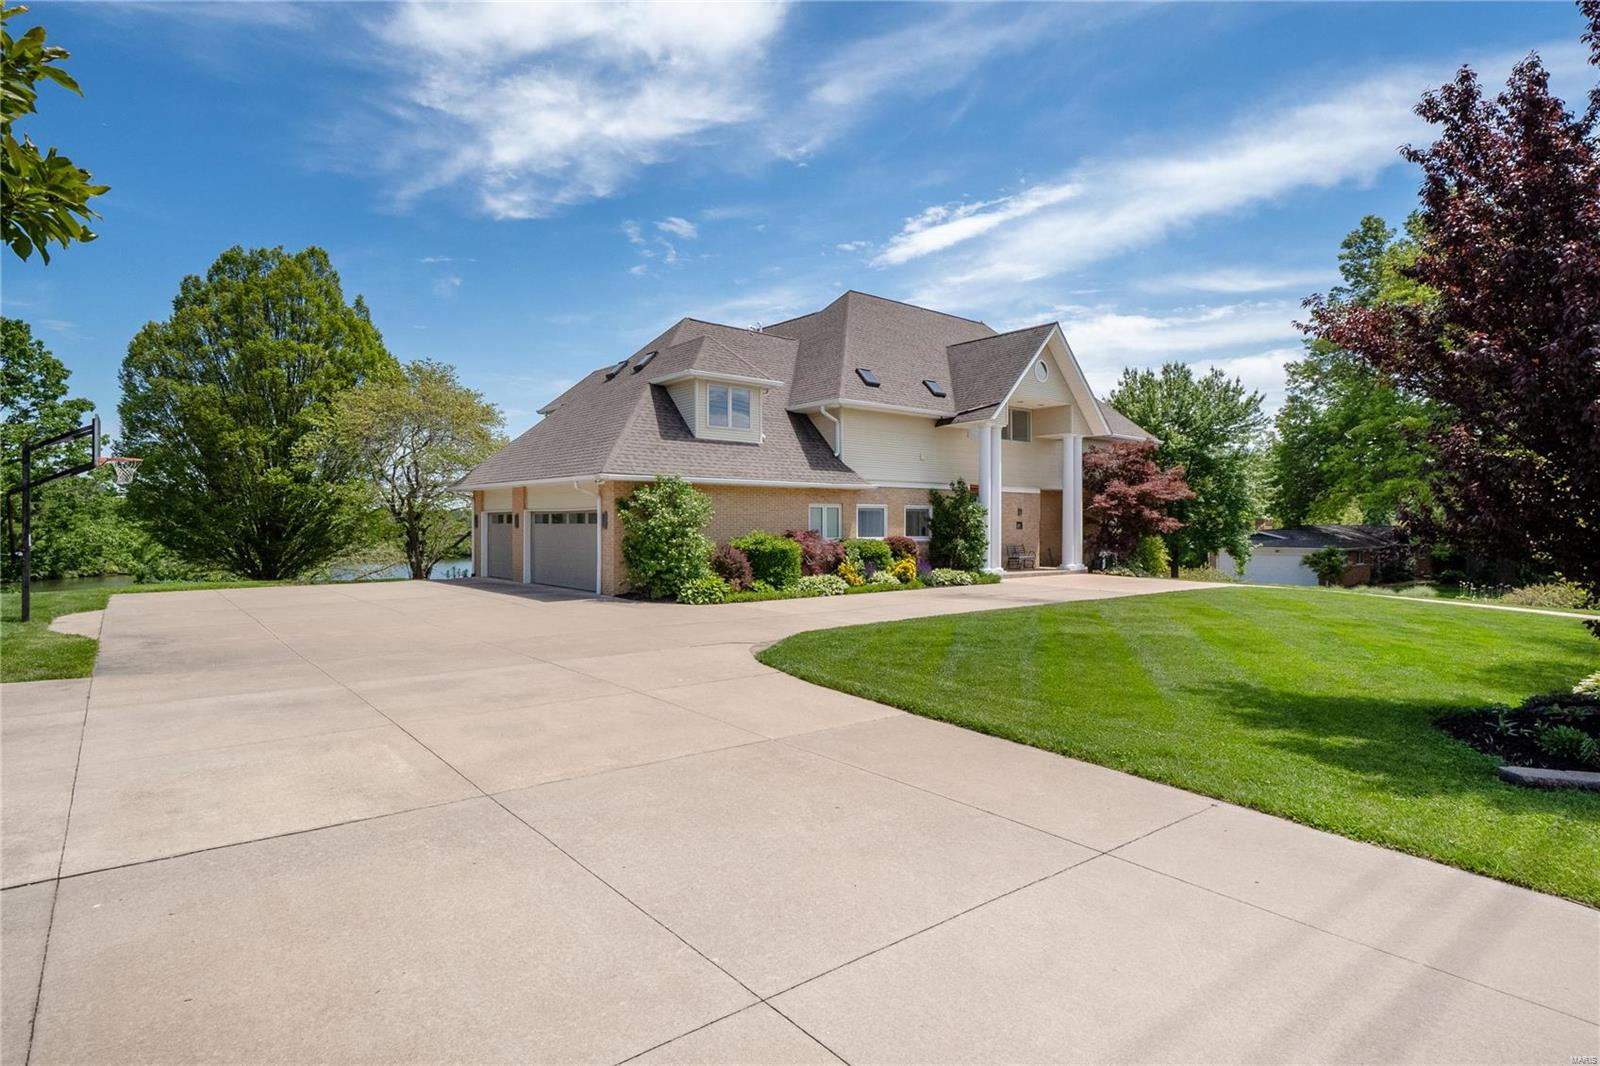 S 116 New Ballas Property Photo 1